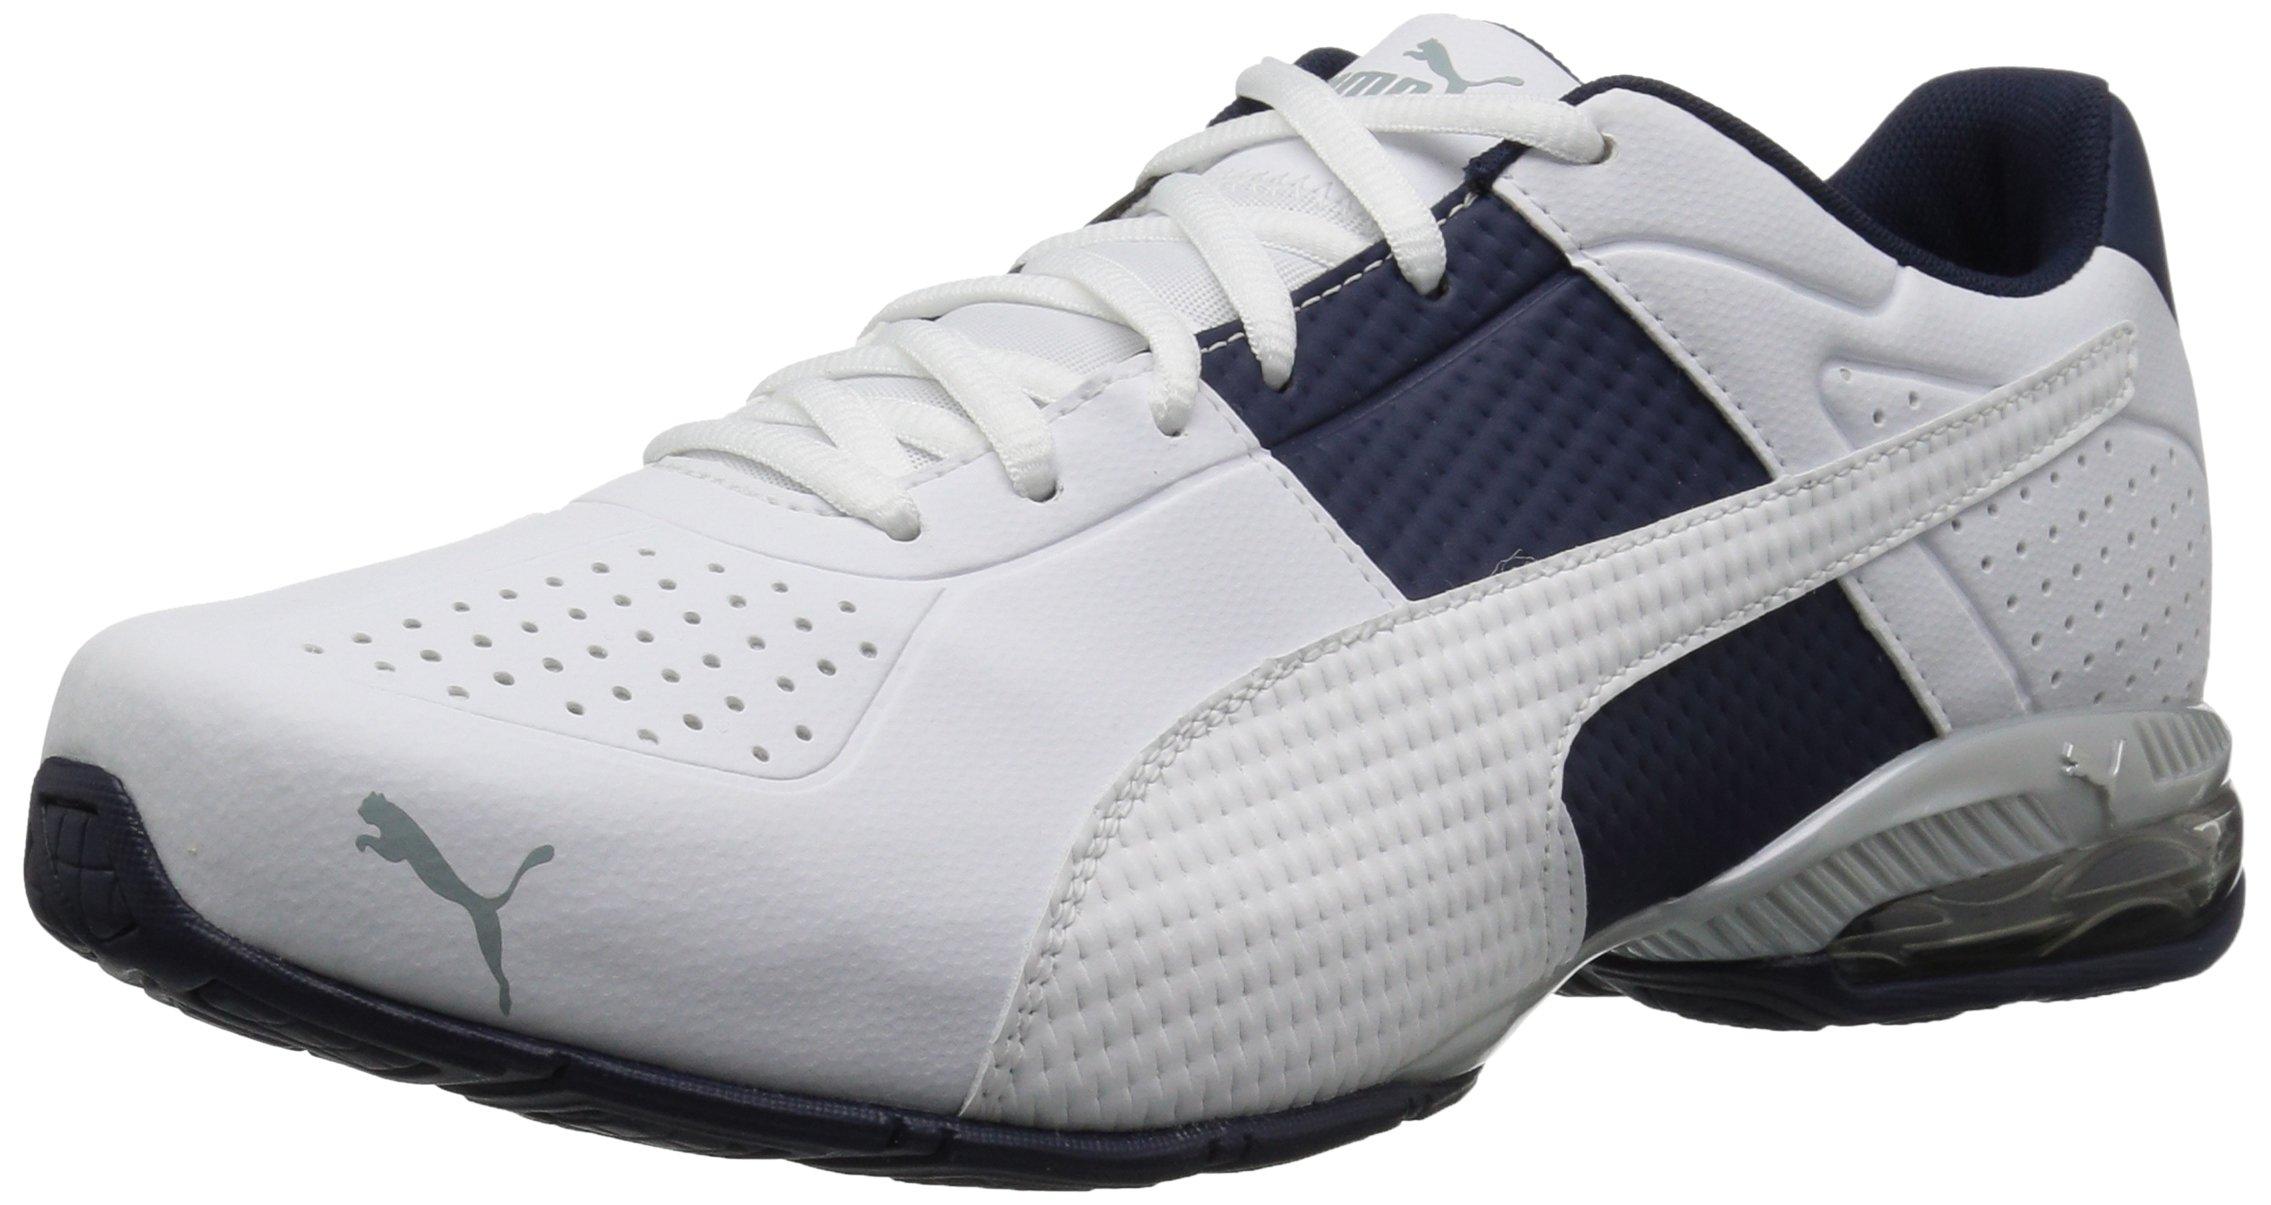 PUMA Men's Cell Surin 2 3D Sneaker, White-Peacoat-Quarry, 10.5 M US